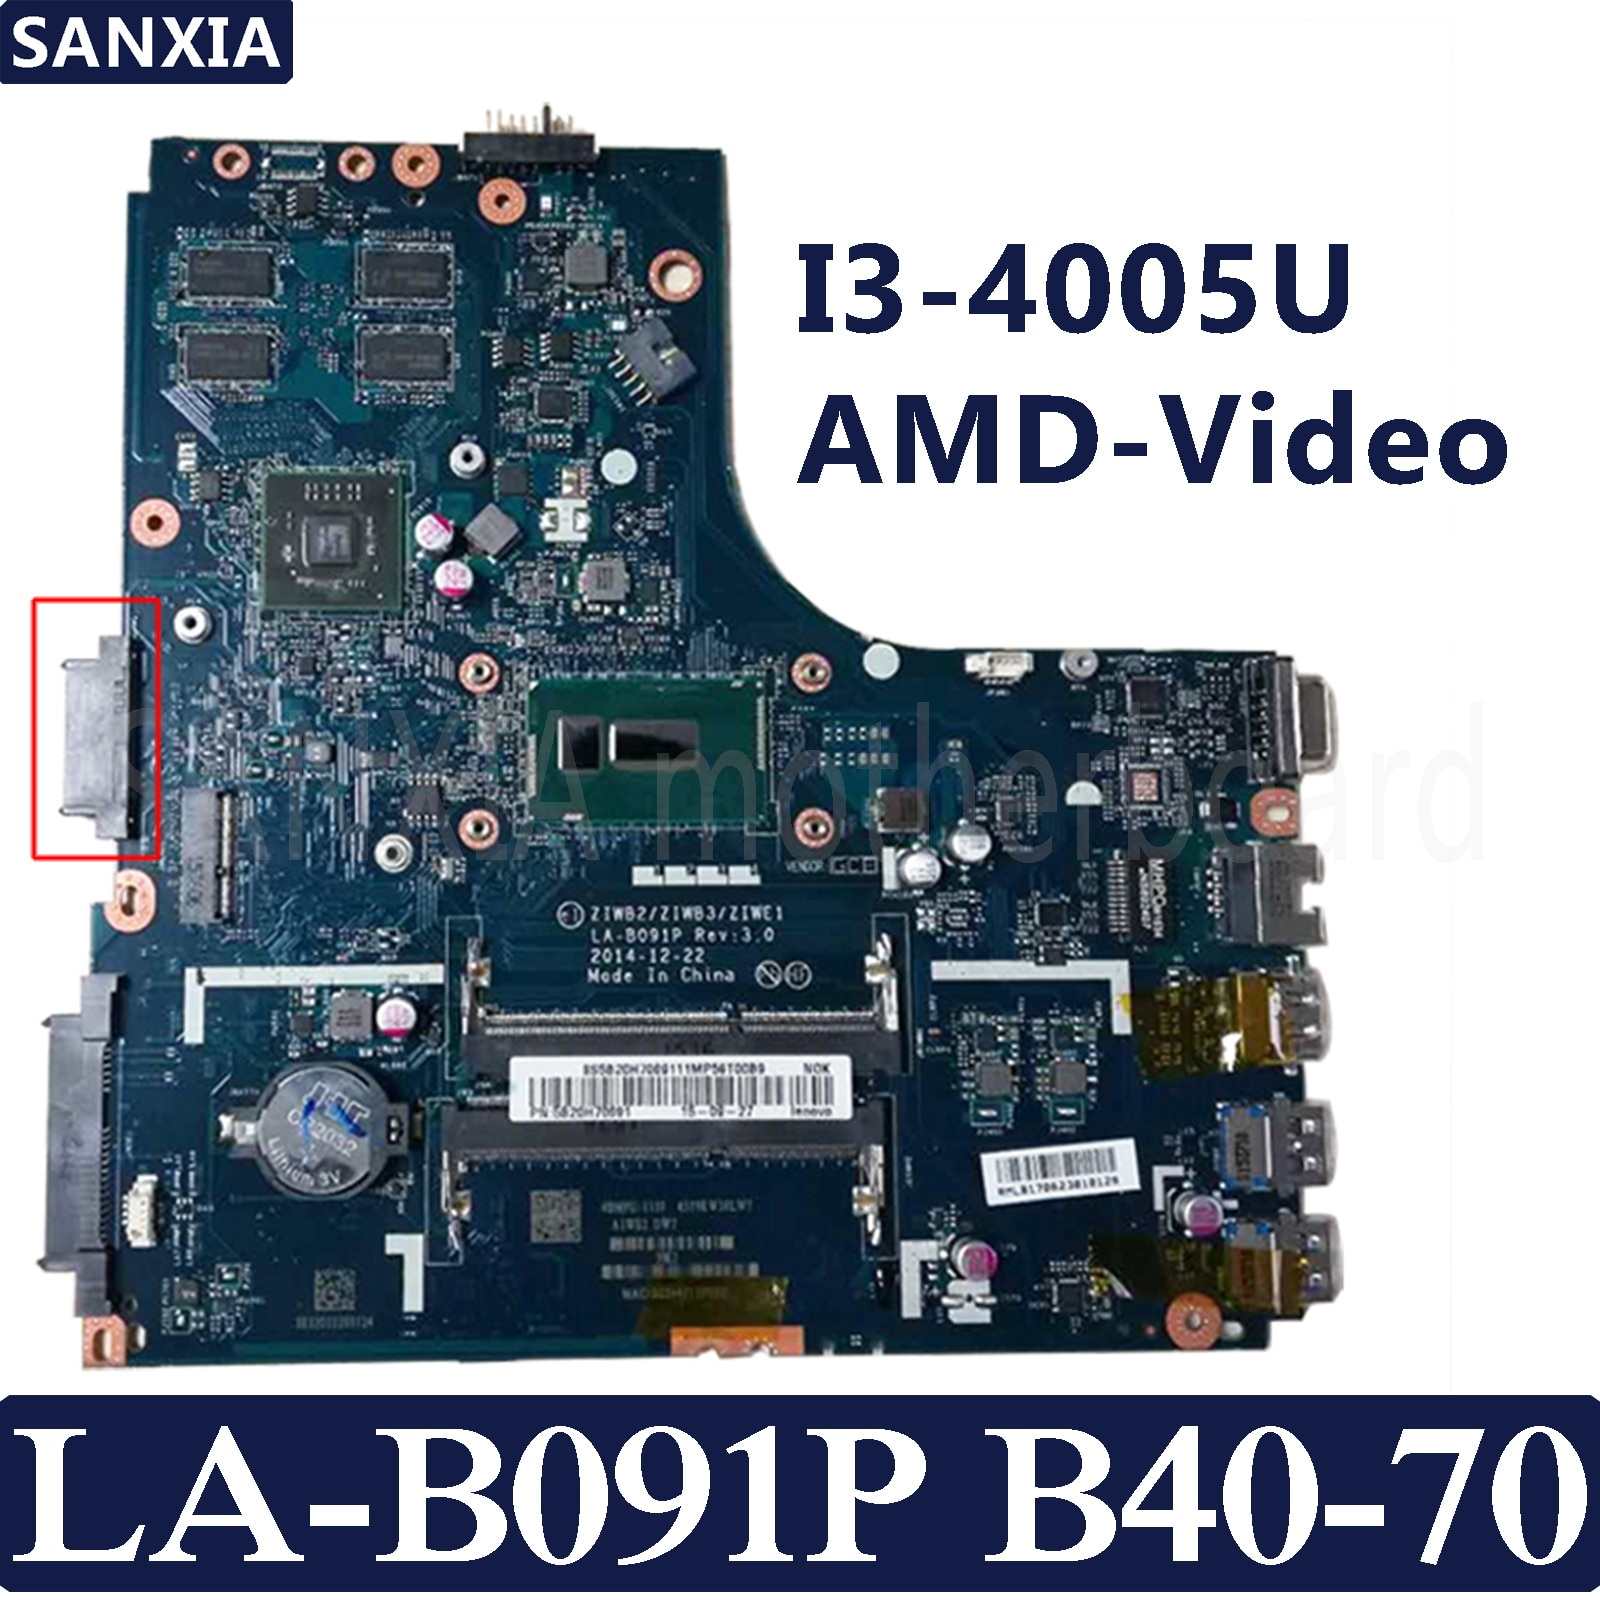 KEFU ZIWB2/ZIWB3/ZIWE1 LA-B091P placa base para portátil para Lenovo B40-70 prueba placa base original I3-4005U AMD-Video